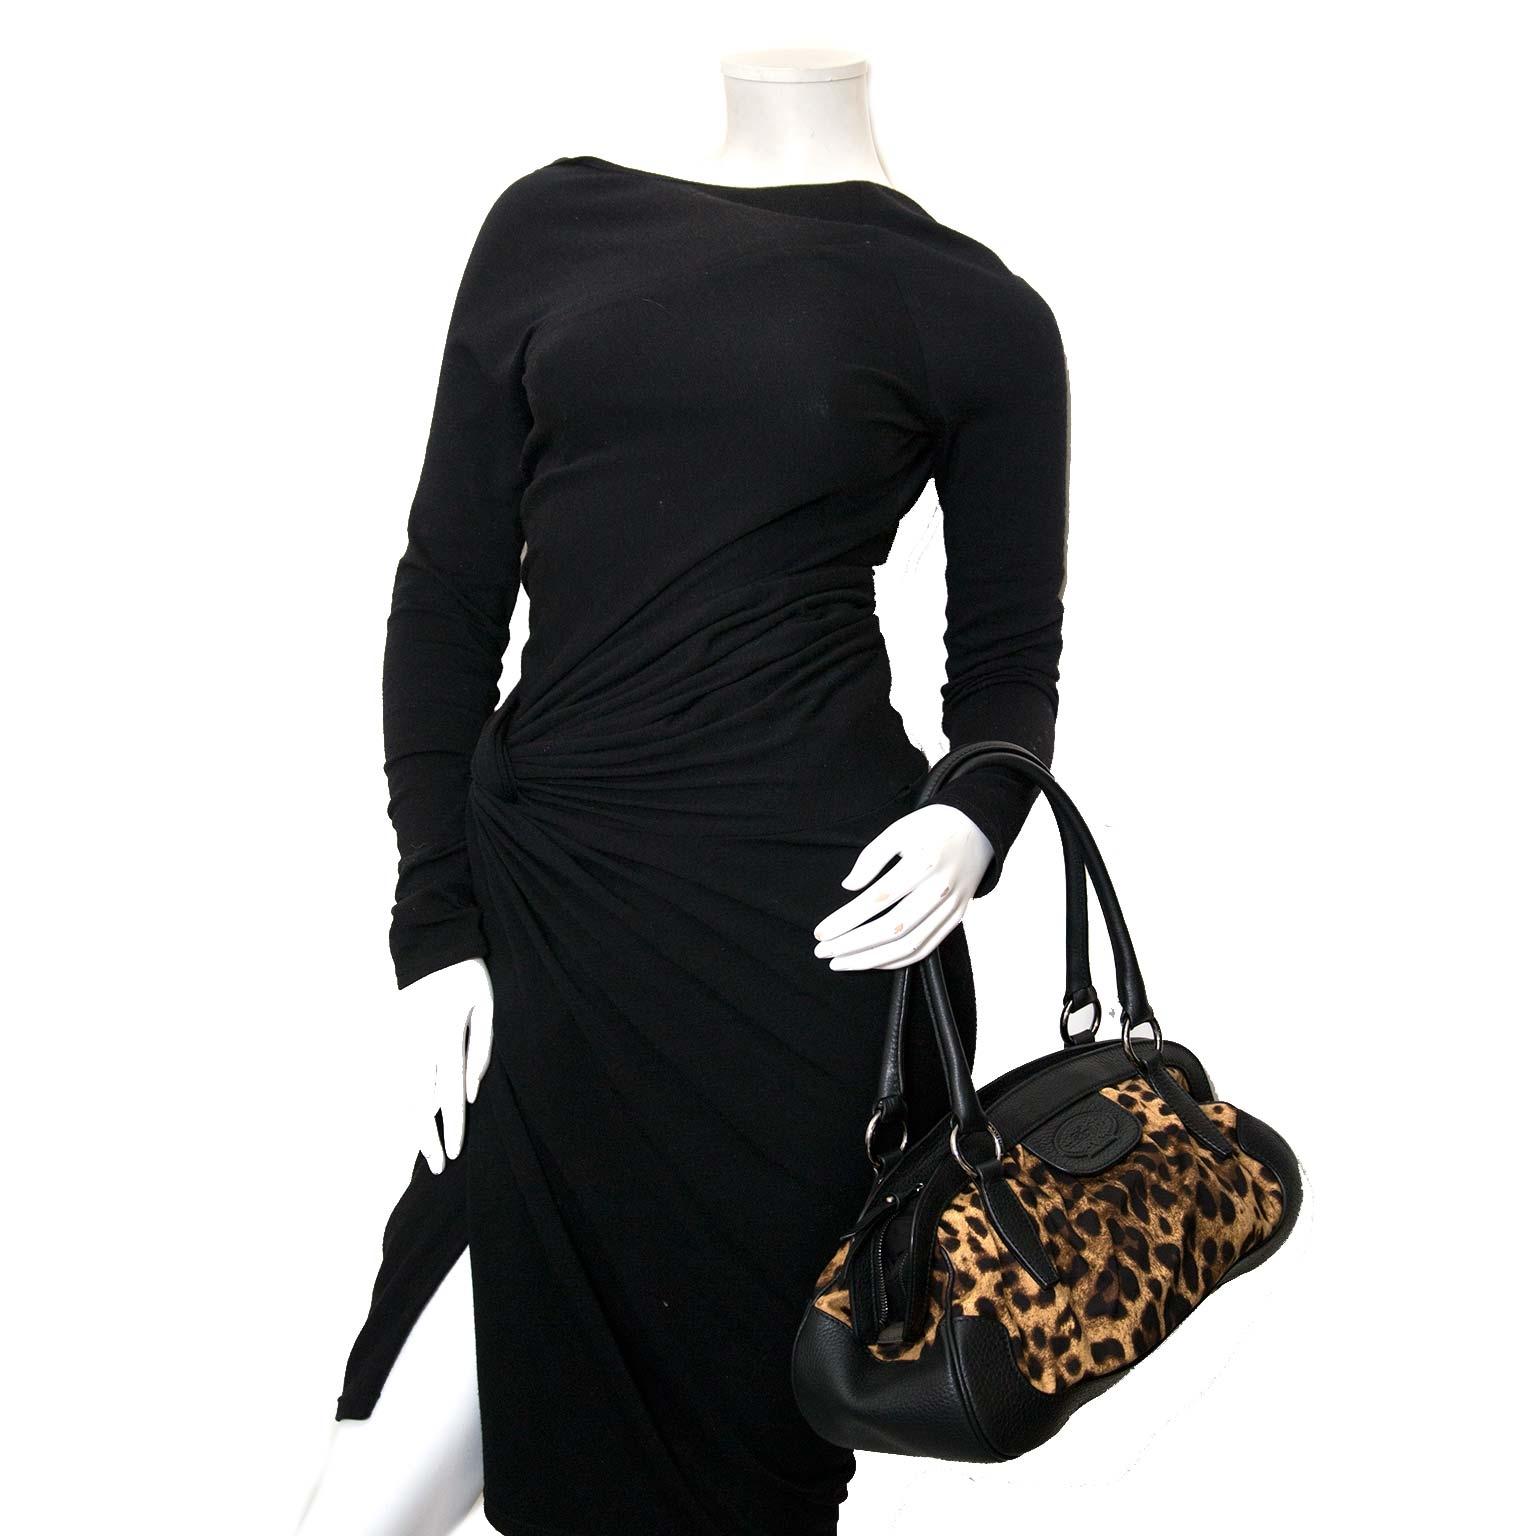 dolce & gabbana animalier leopard hobo tas nu te koop bij labellov vintage mode webshop belgië